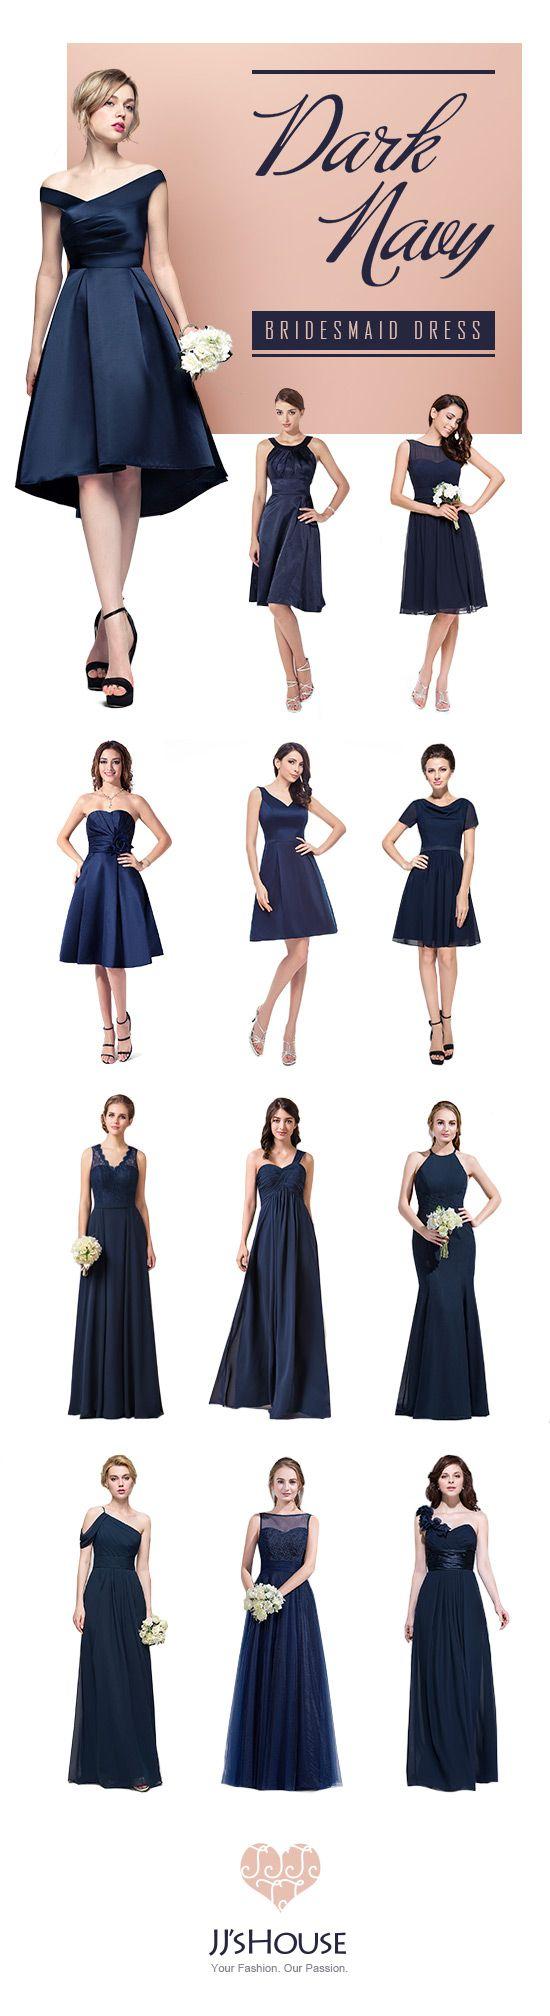 Dark Navy Bridesmaid Dress! #Bridesmaiddress